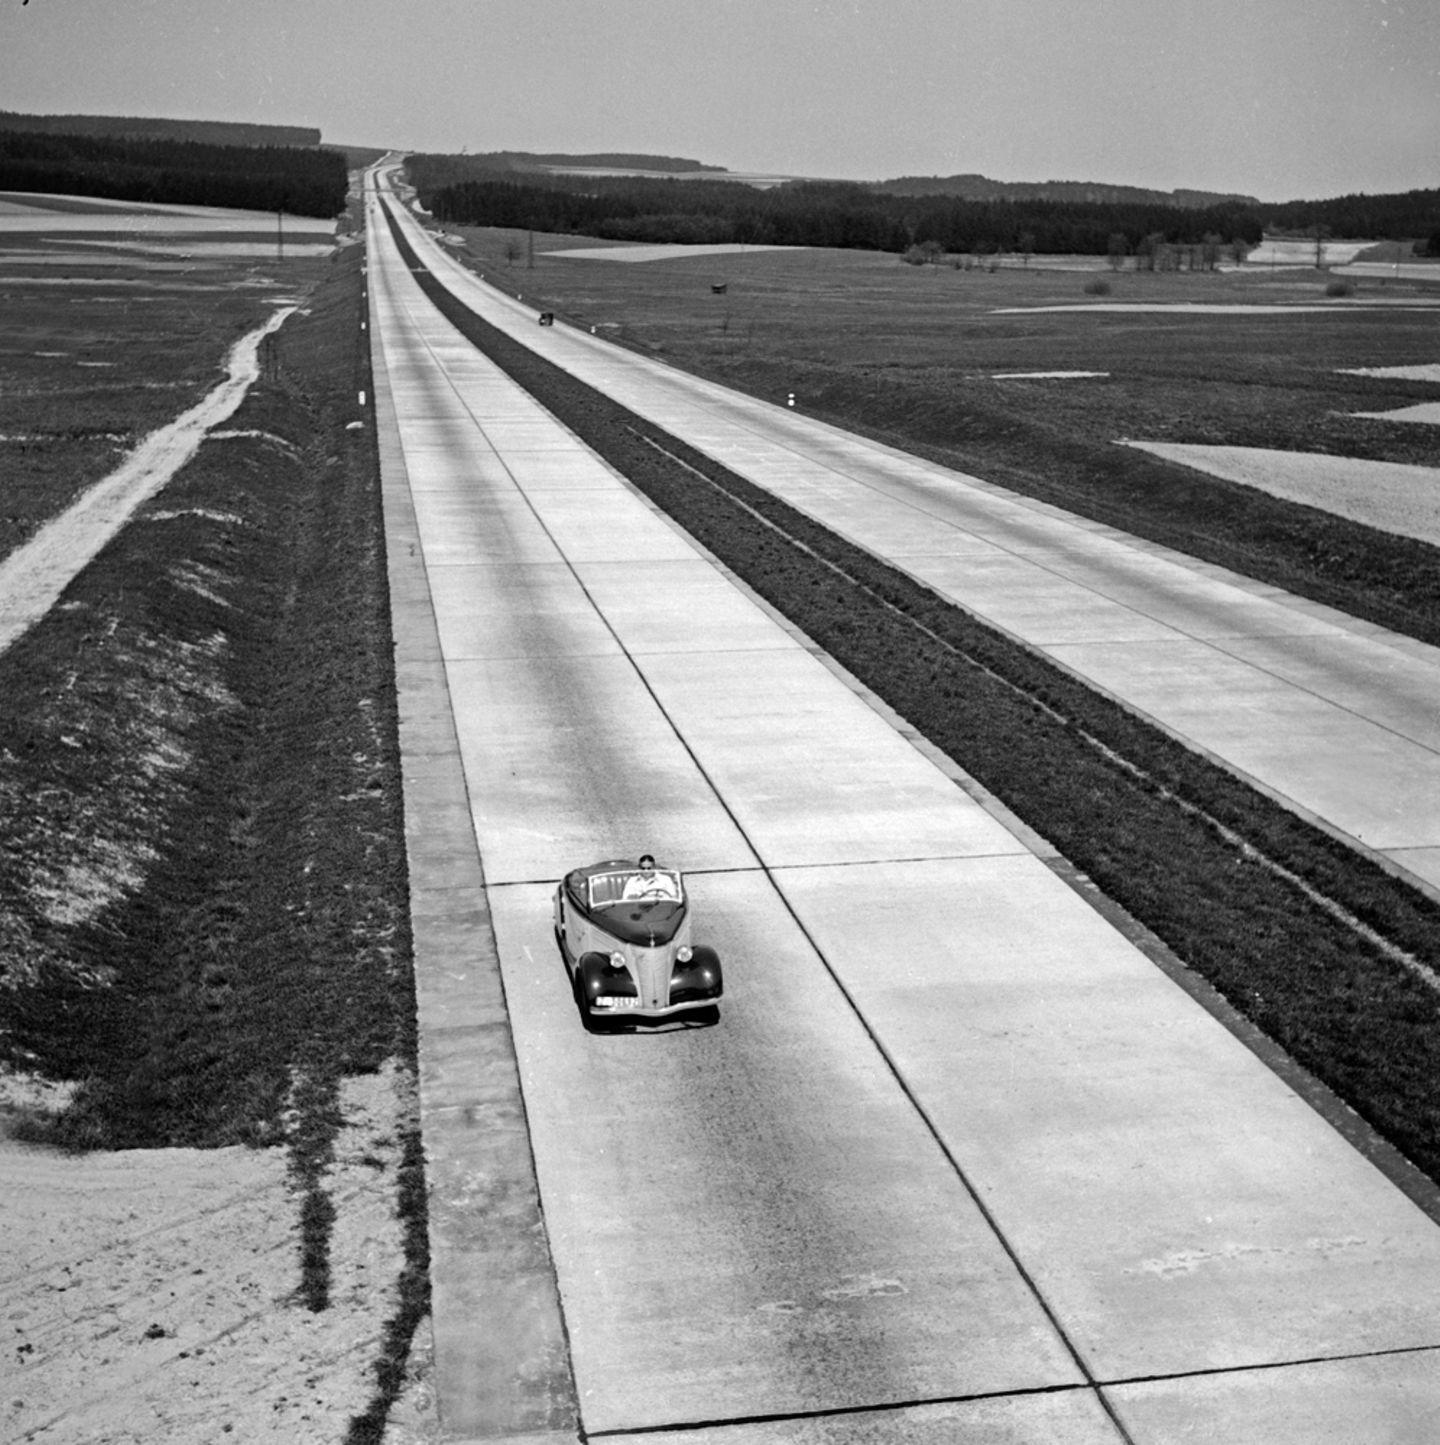 Verwaiste Autobahn